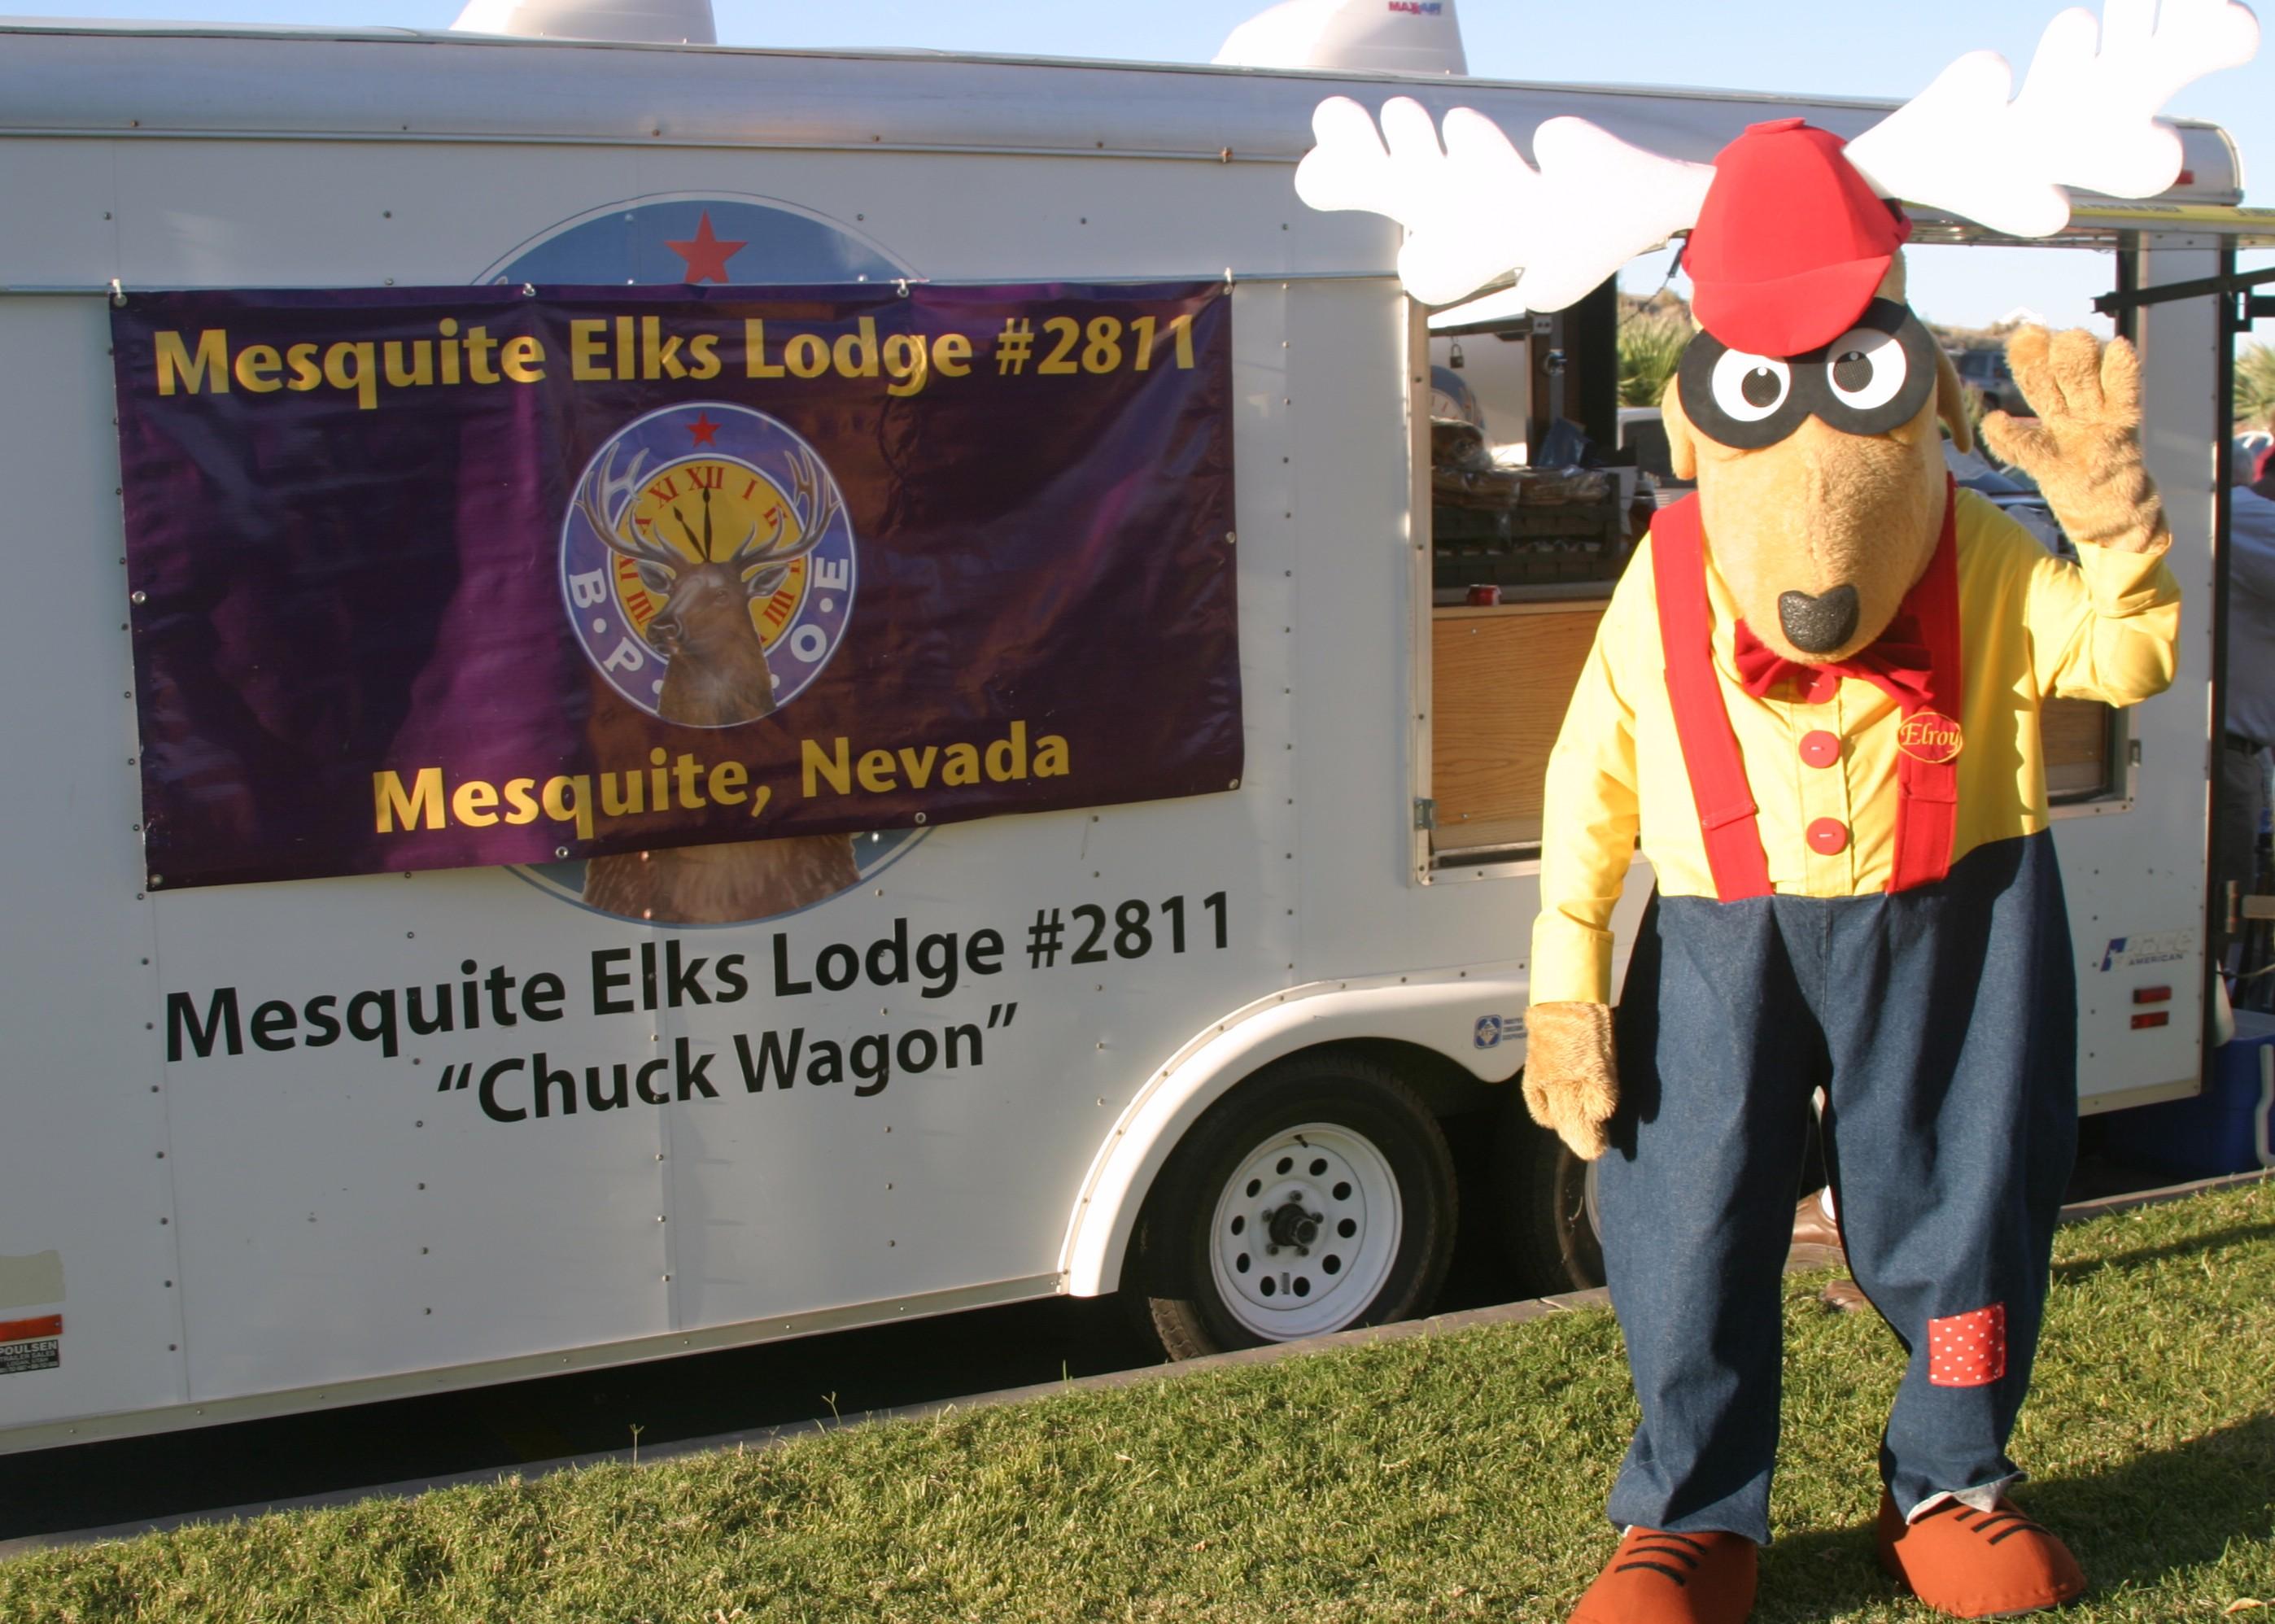 Mesquite Elks Lodge #2811 serves area Veterans